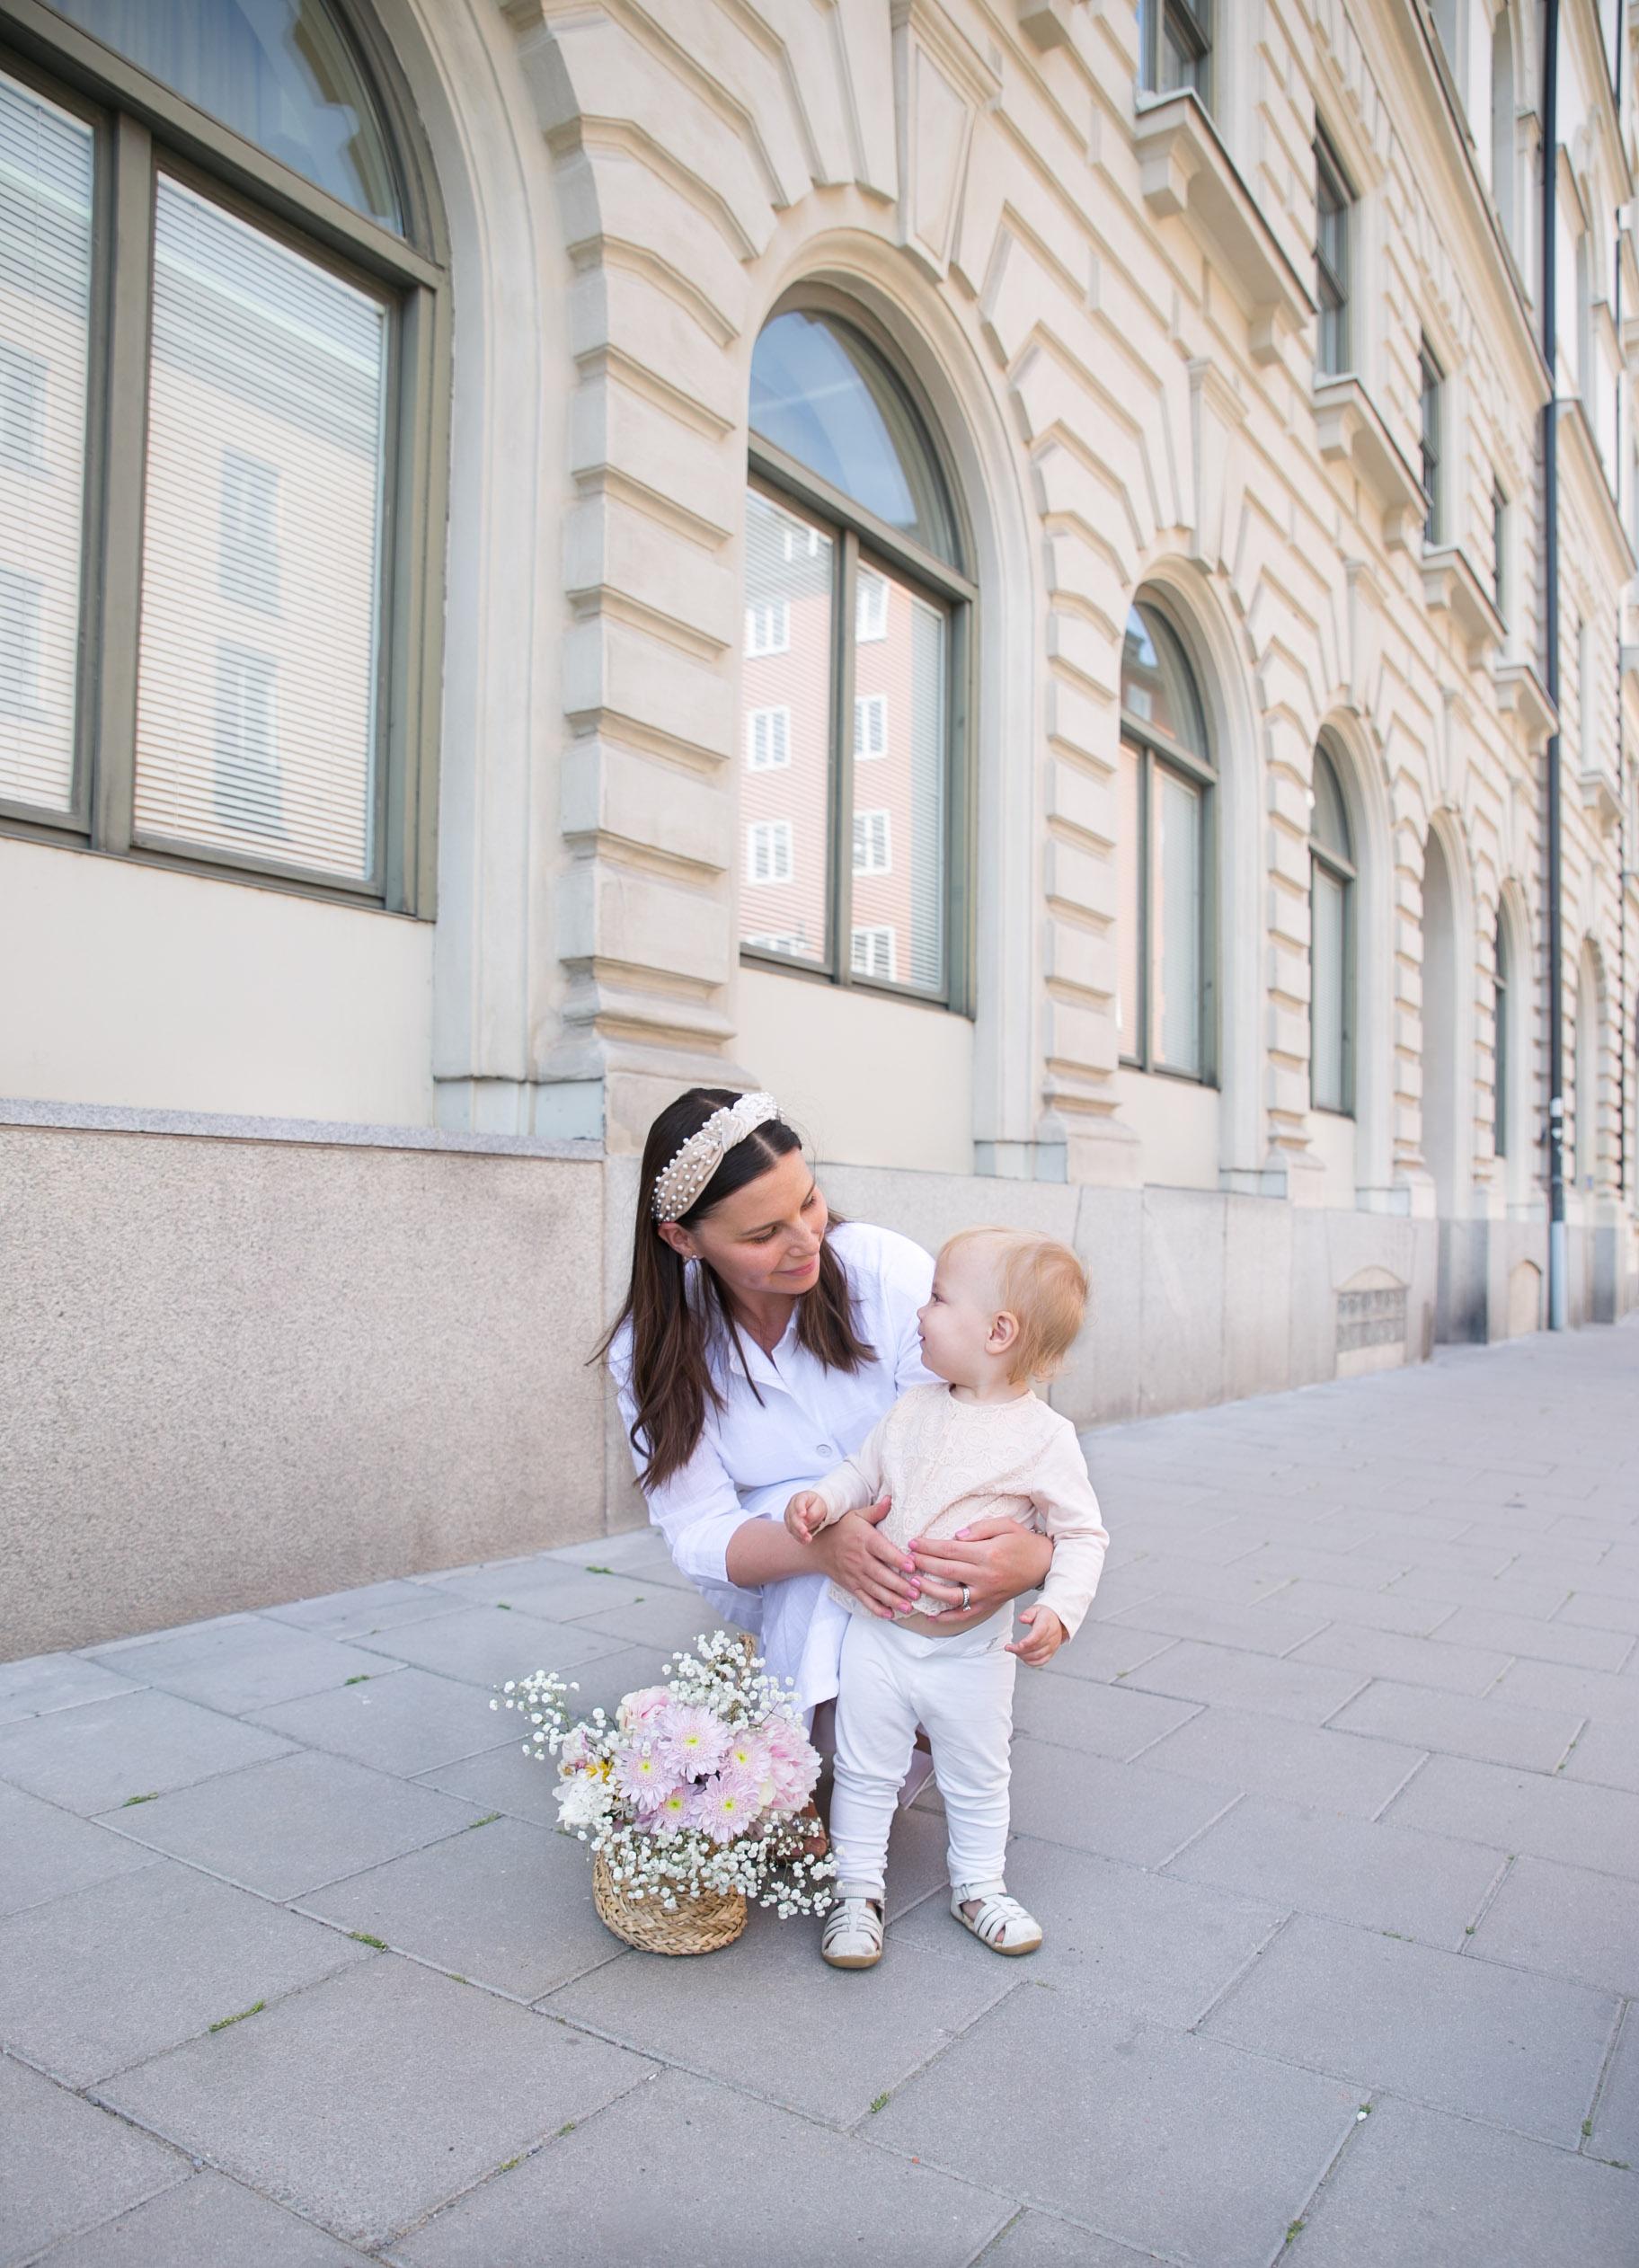 Angelica Aurell mammablogg esprit hm barnklader barnmode sommar.jpg